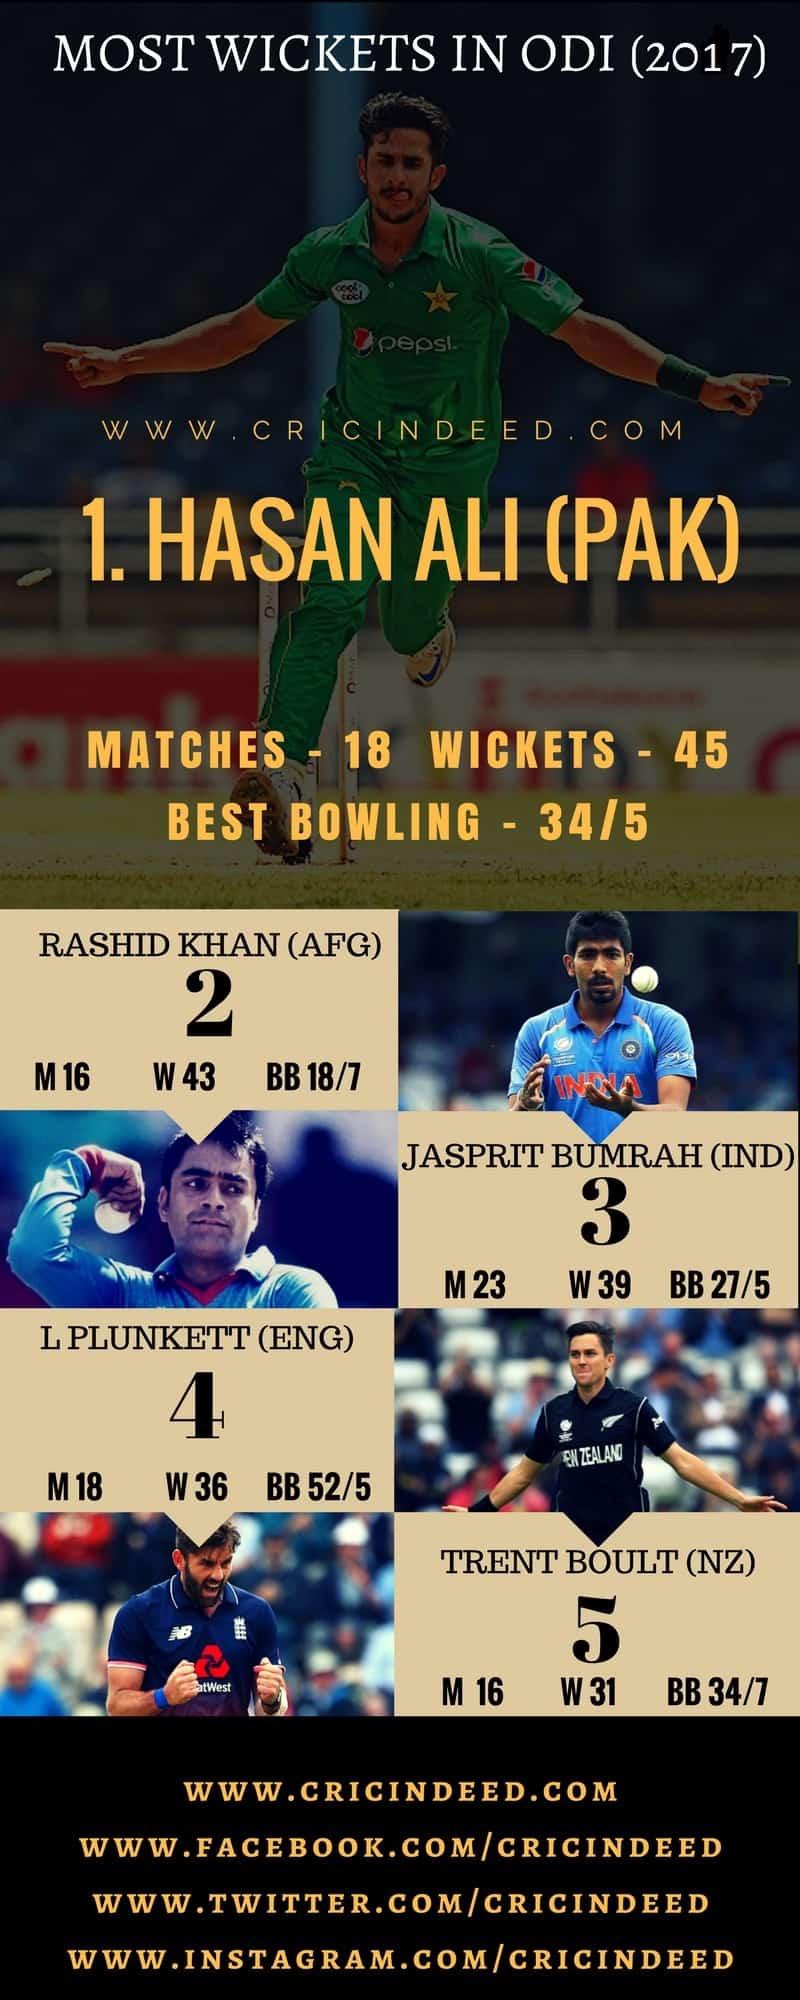 most wickets in odi 2017